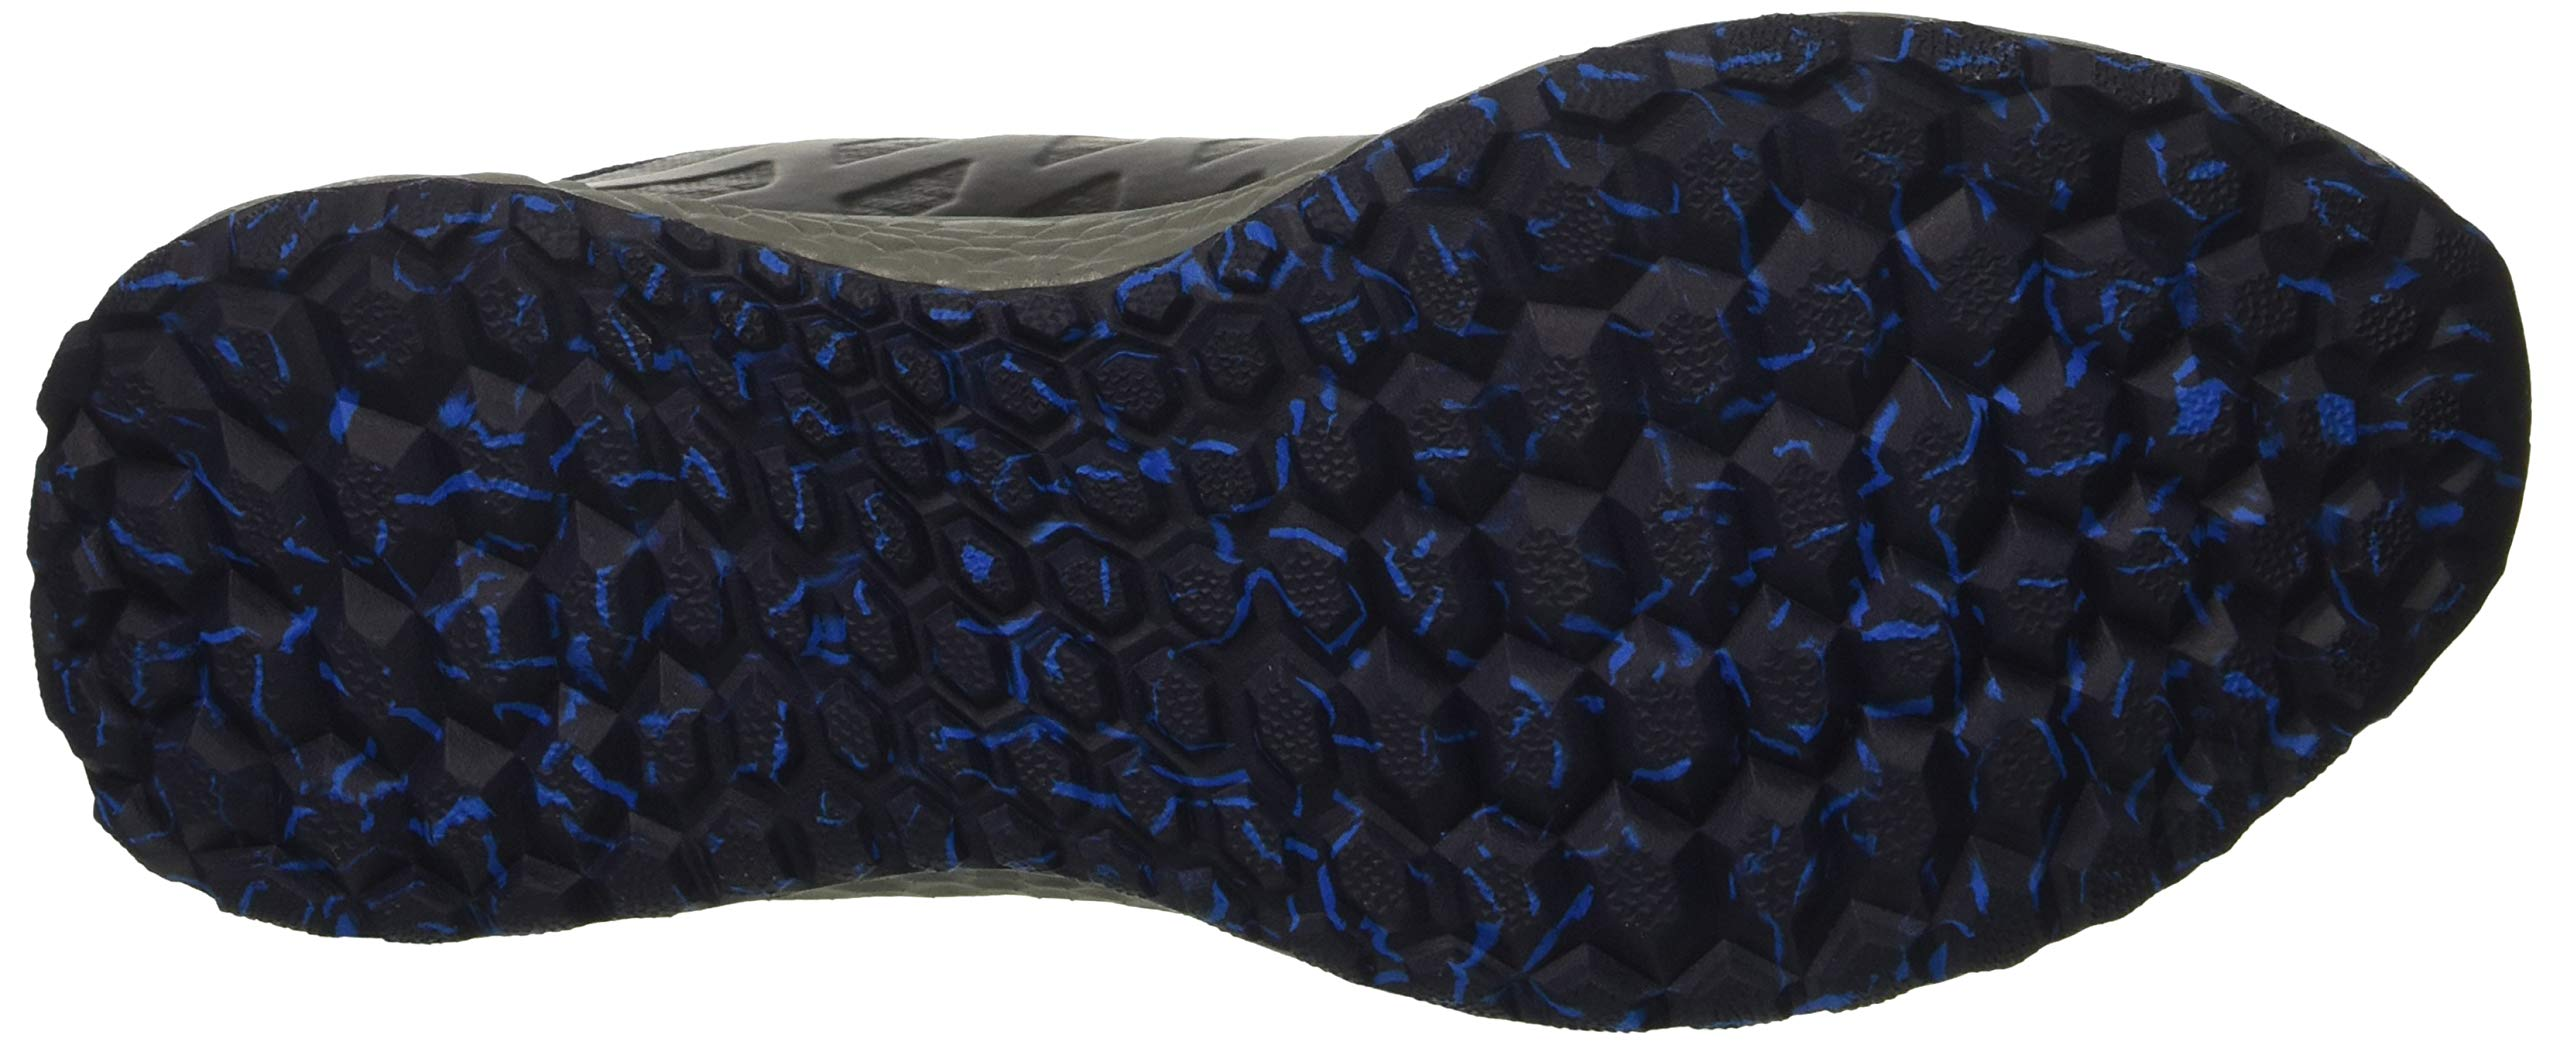 New Balance Men's Kaymin V1 Fresh Foam Trail Running Shoe Pigment/Laser Blue 1.5 D US by New Balance (Image #3)